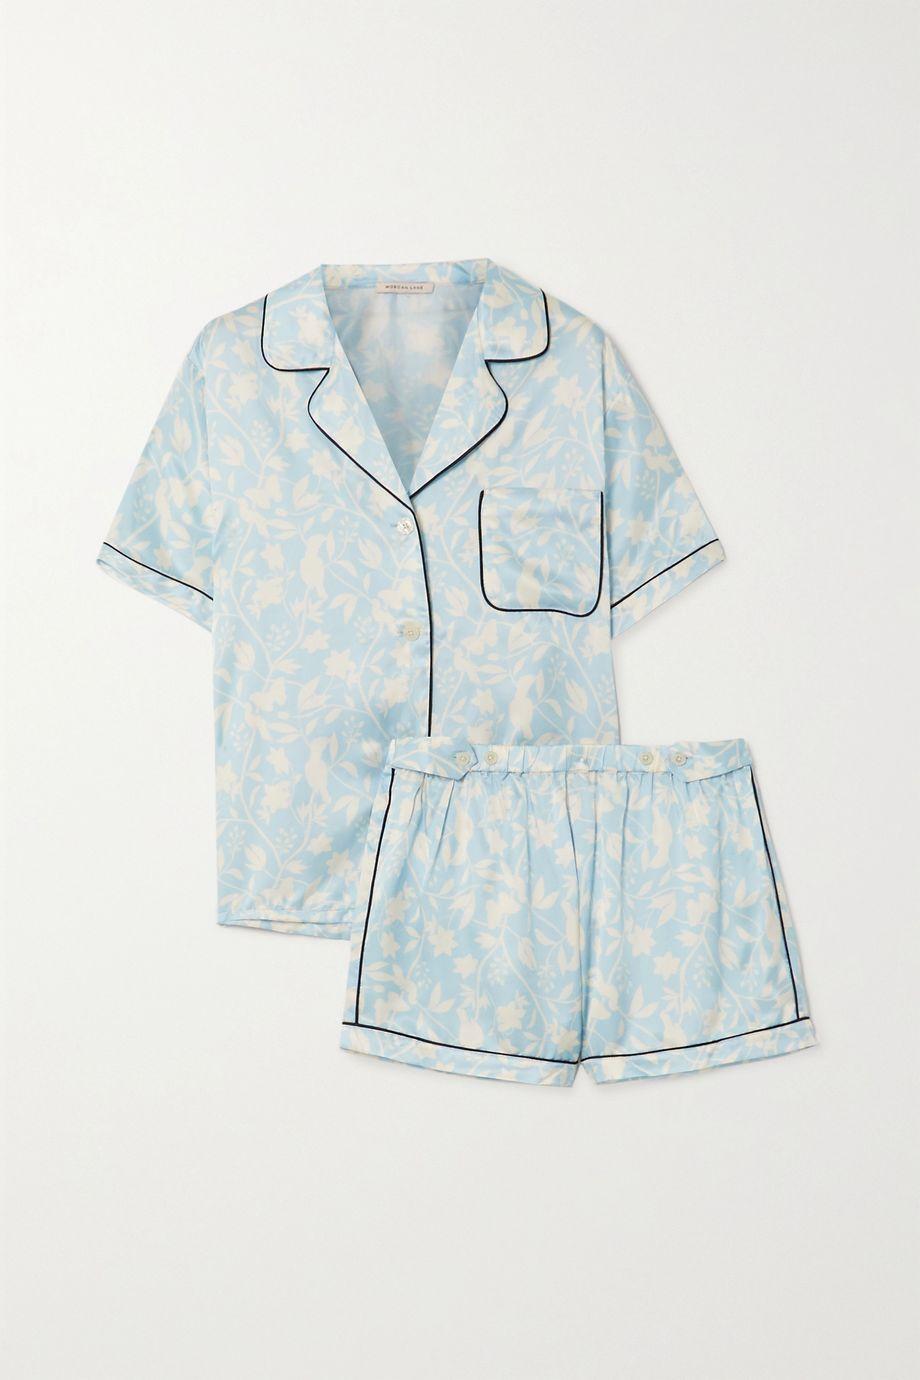 Morgan Lane Katelyn Fiona Pyjama aus Satin mit Blumenprint